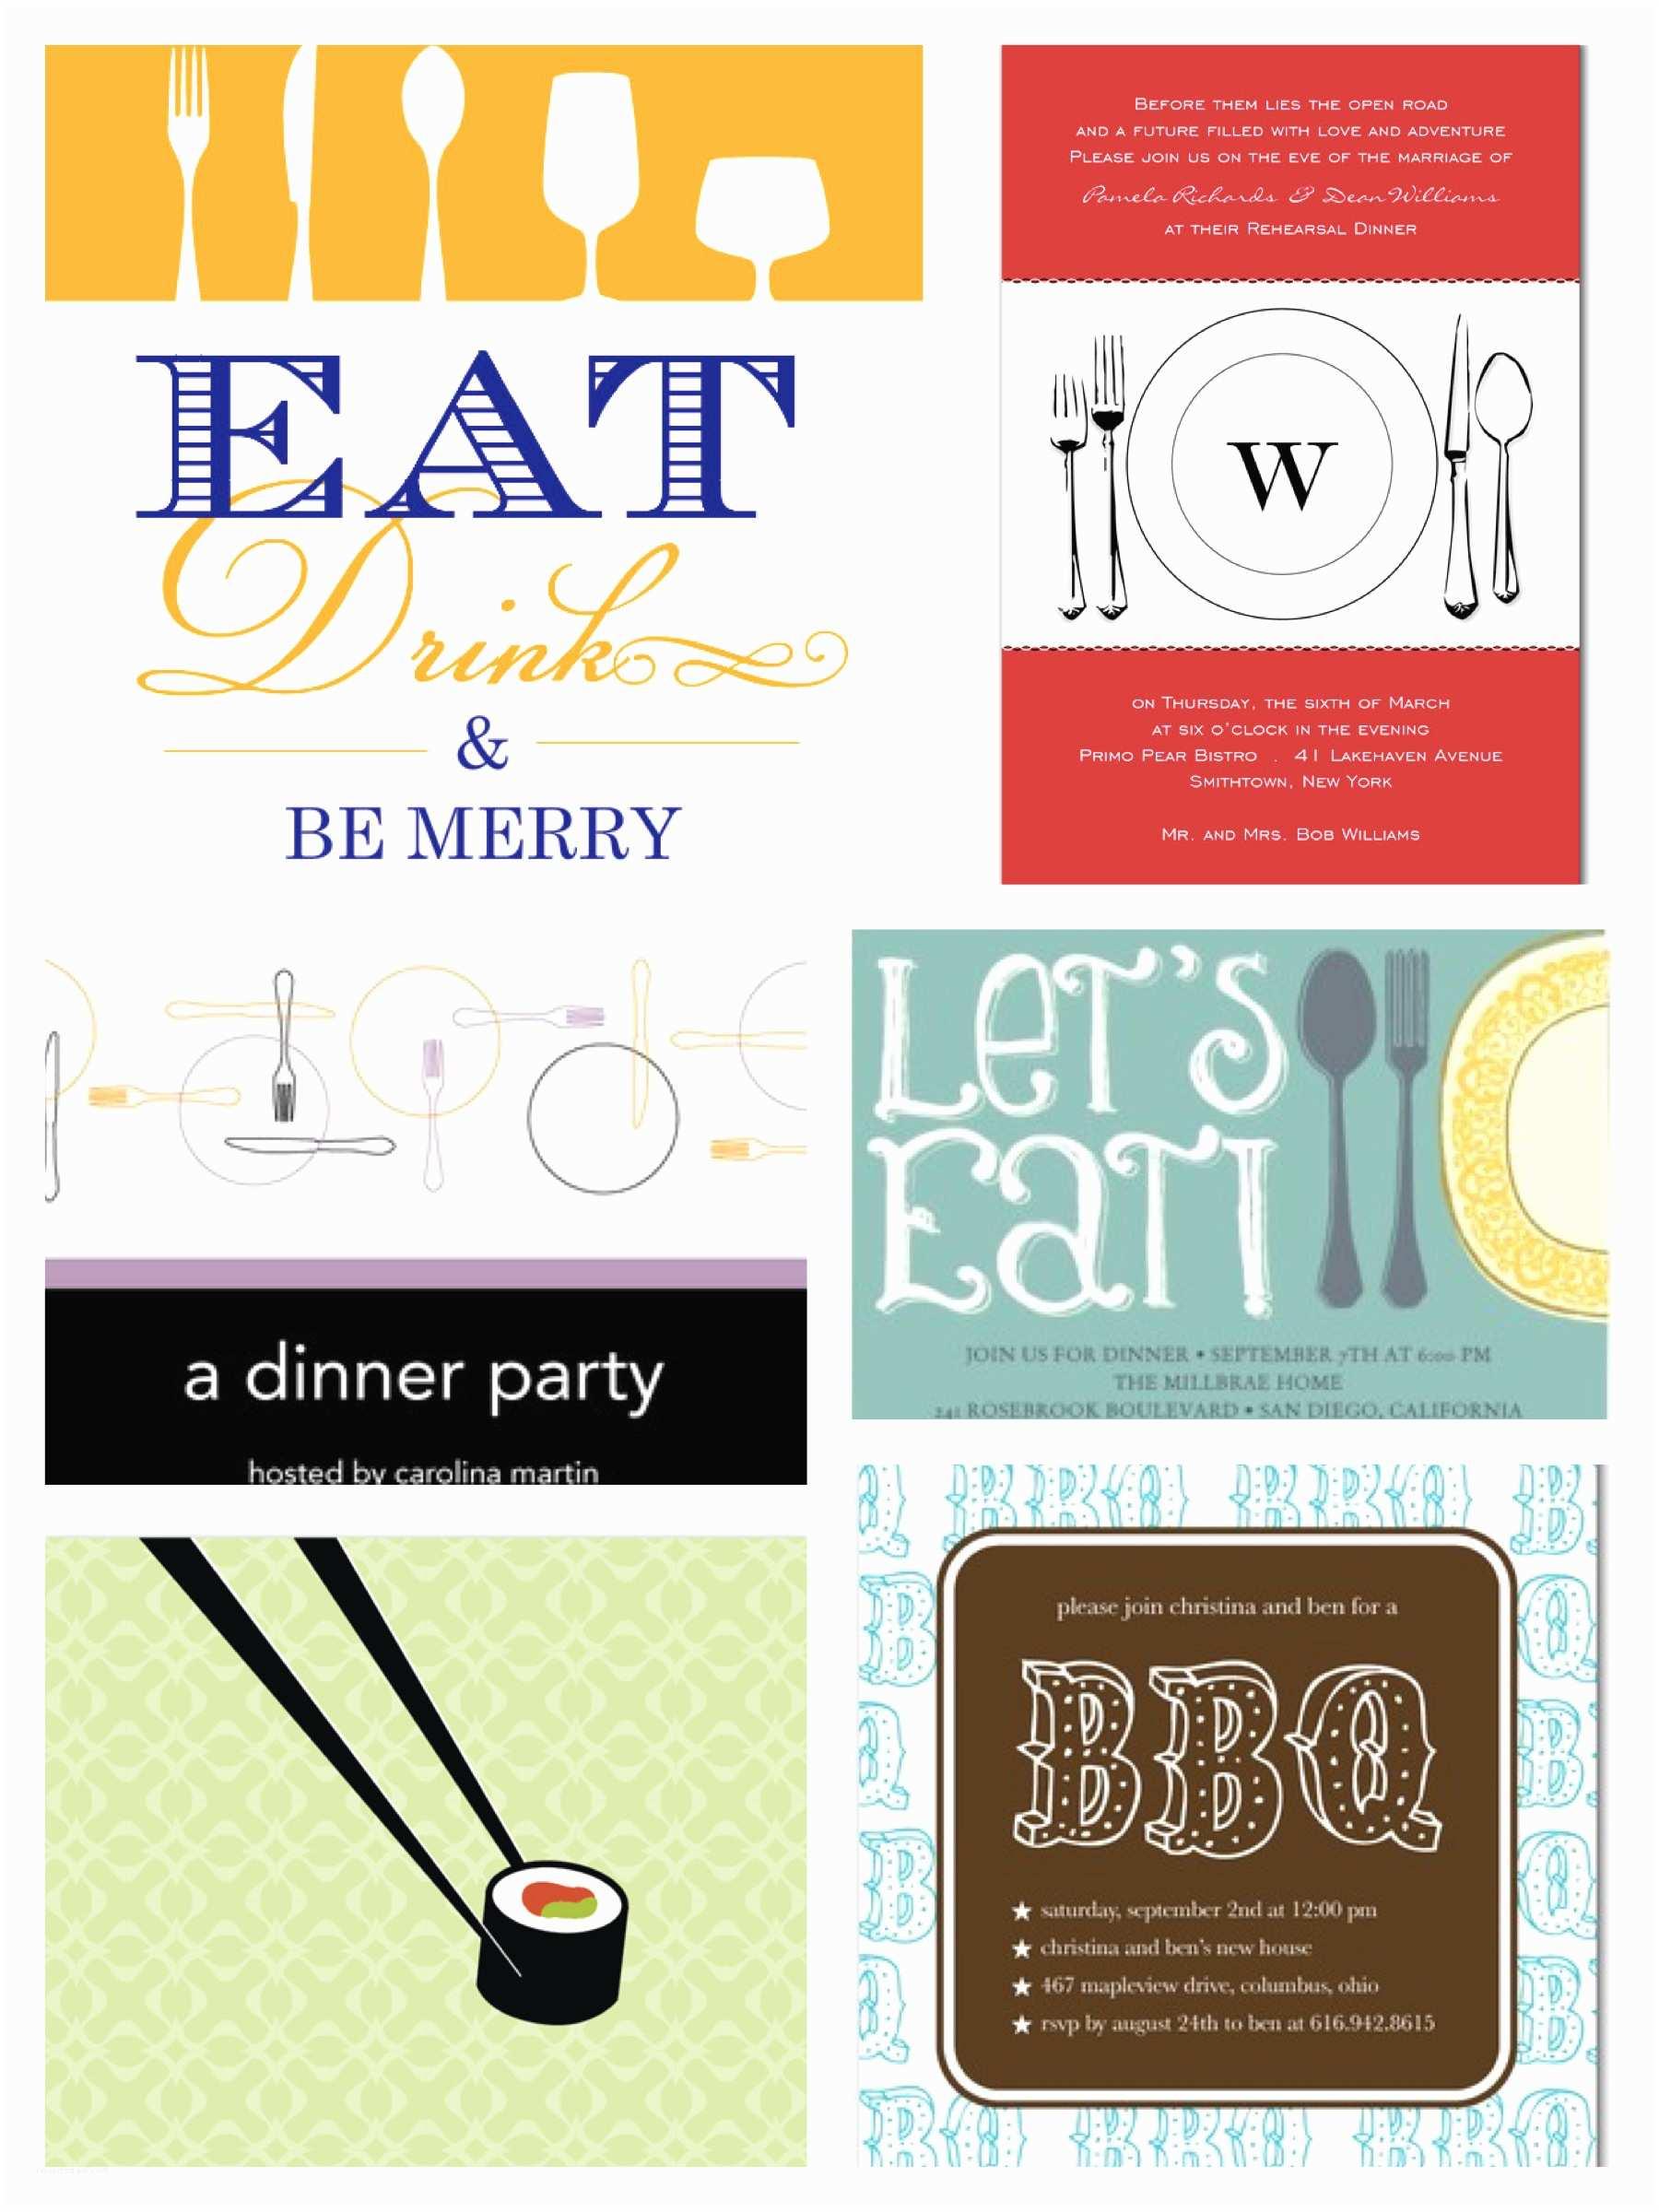 Dinner Party Invitations Rehearsal Dinner & Dinner Party Invitations